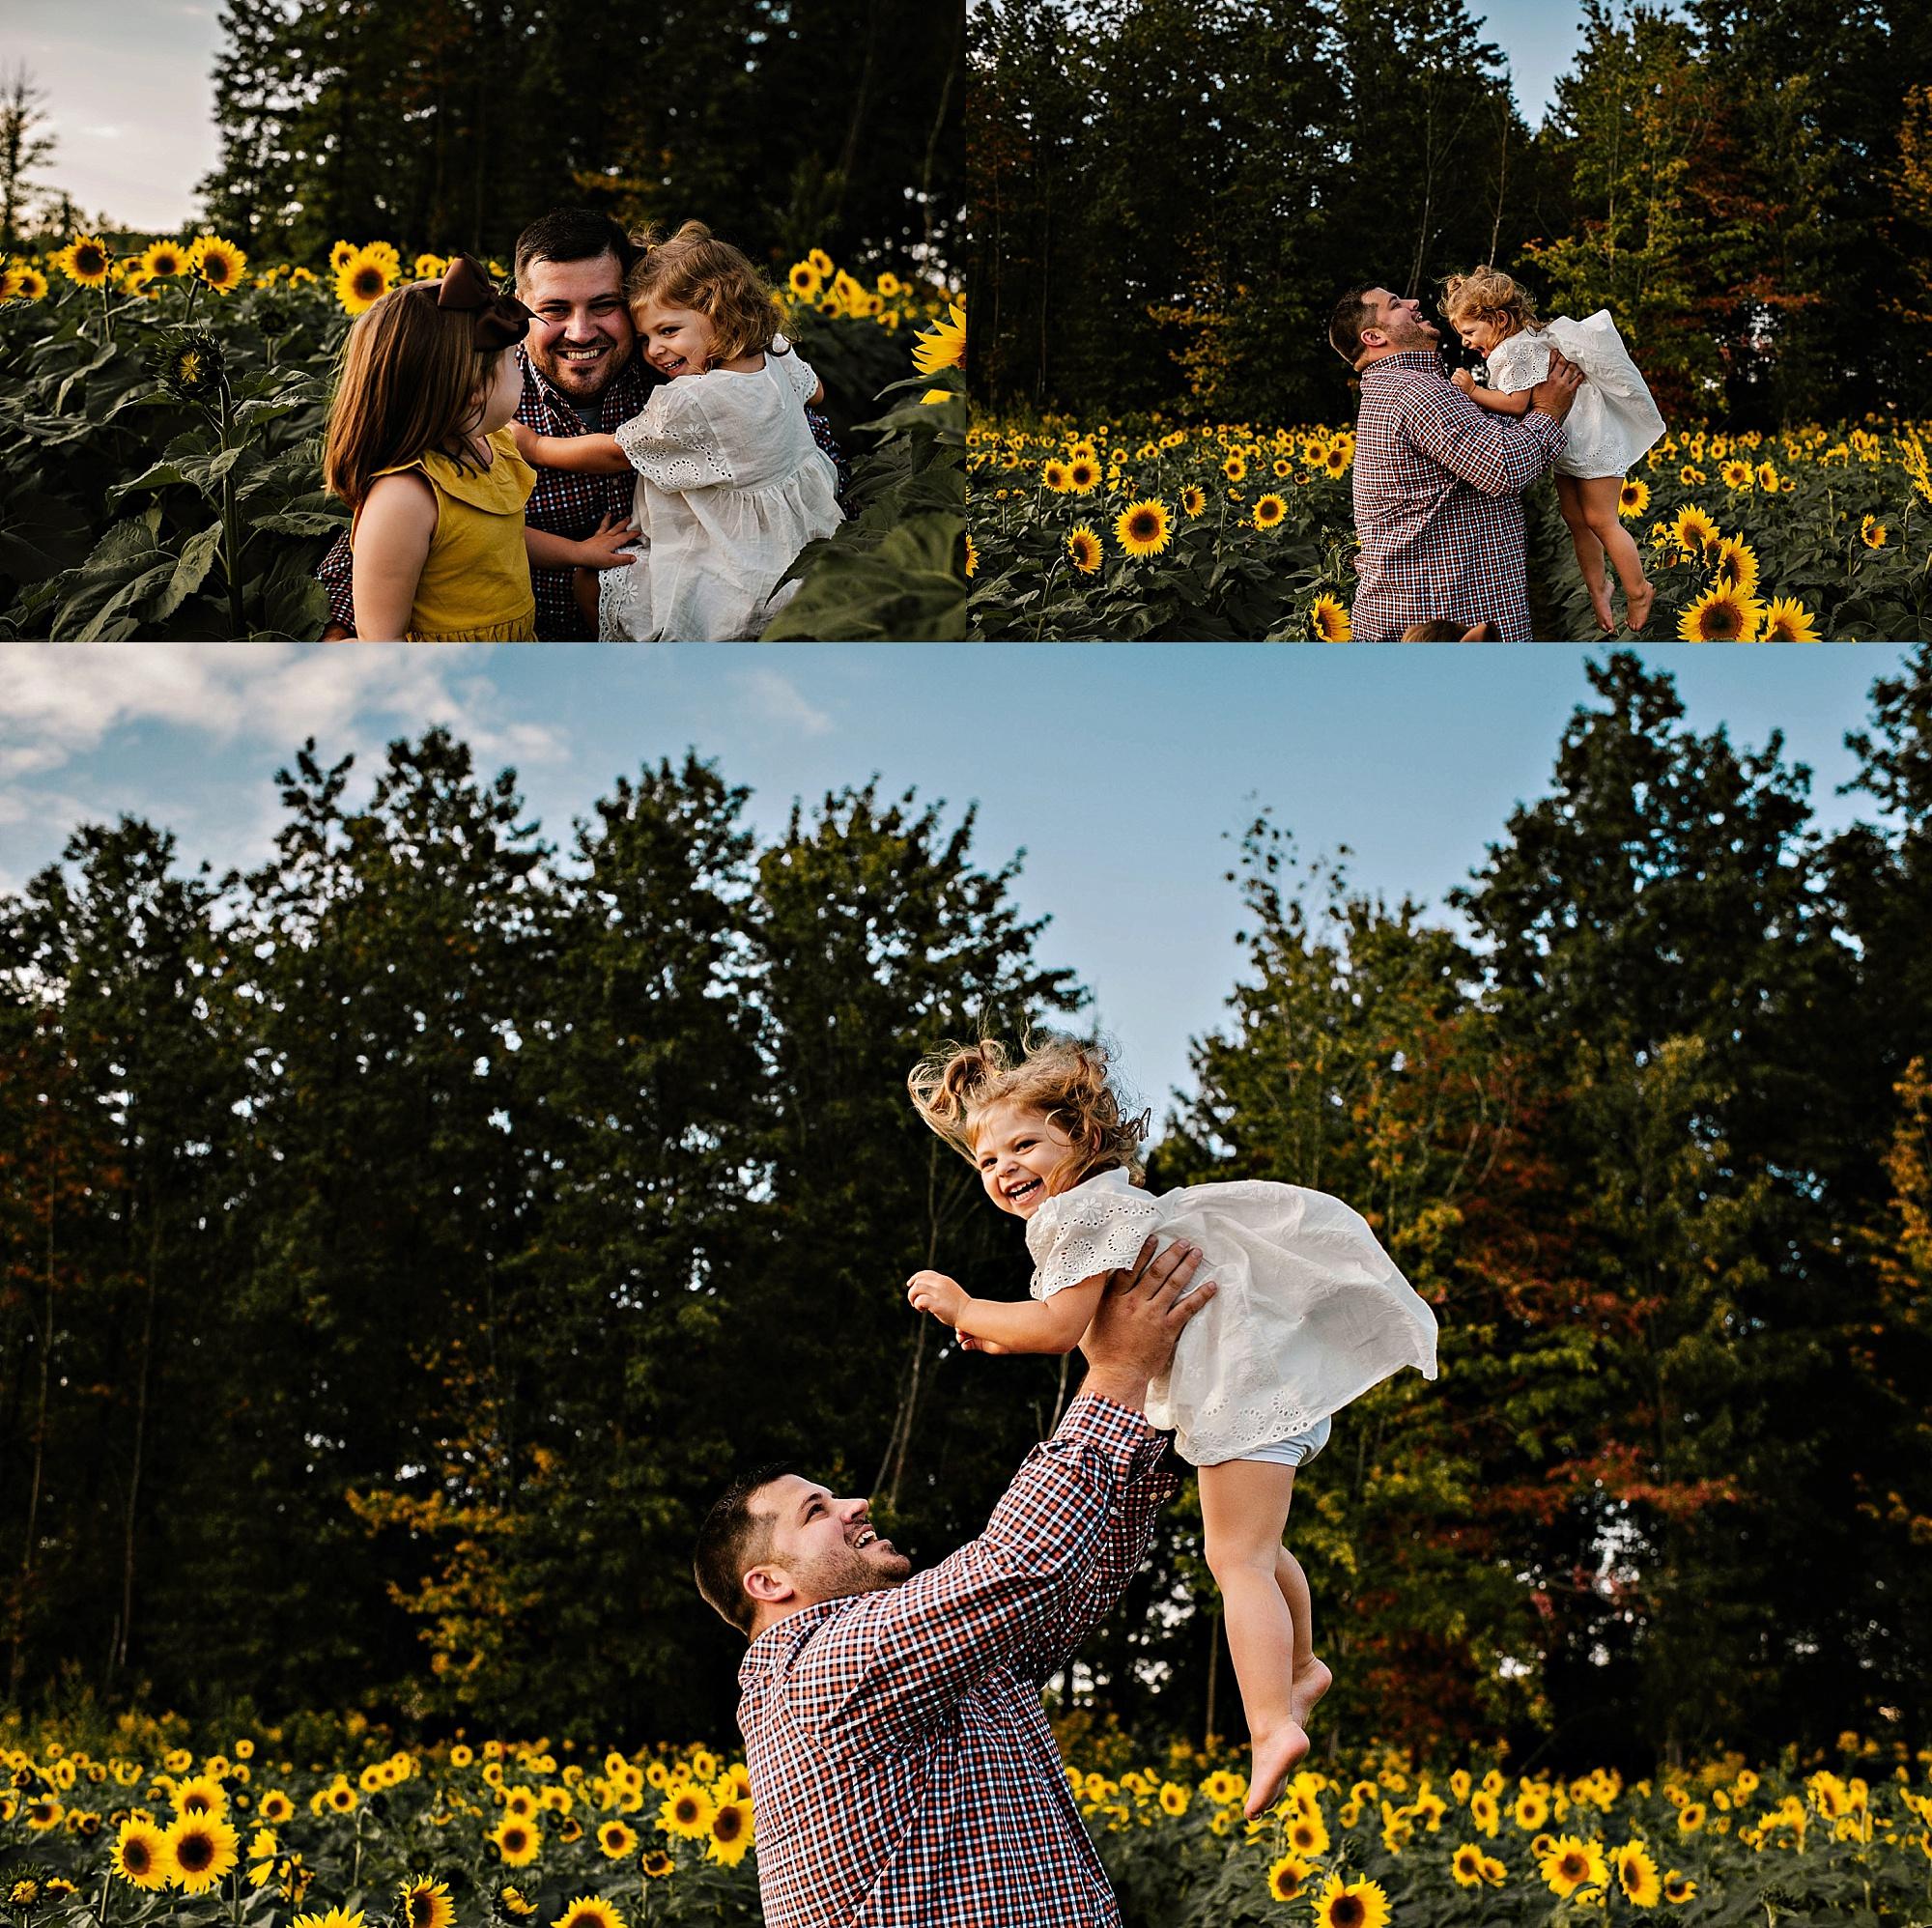 Rutherford-family-cleveland-photographer-lauren-grayson-sunflower-field-session_0020.jpg